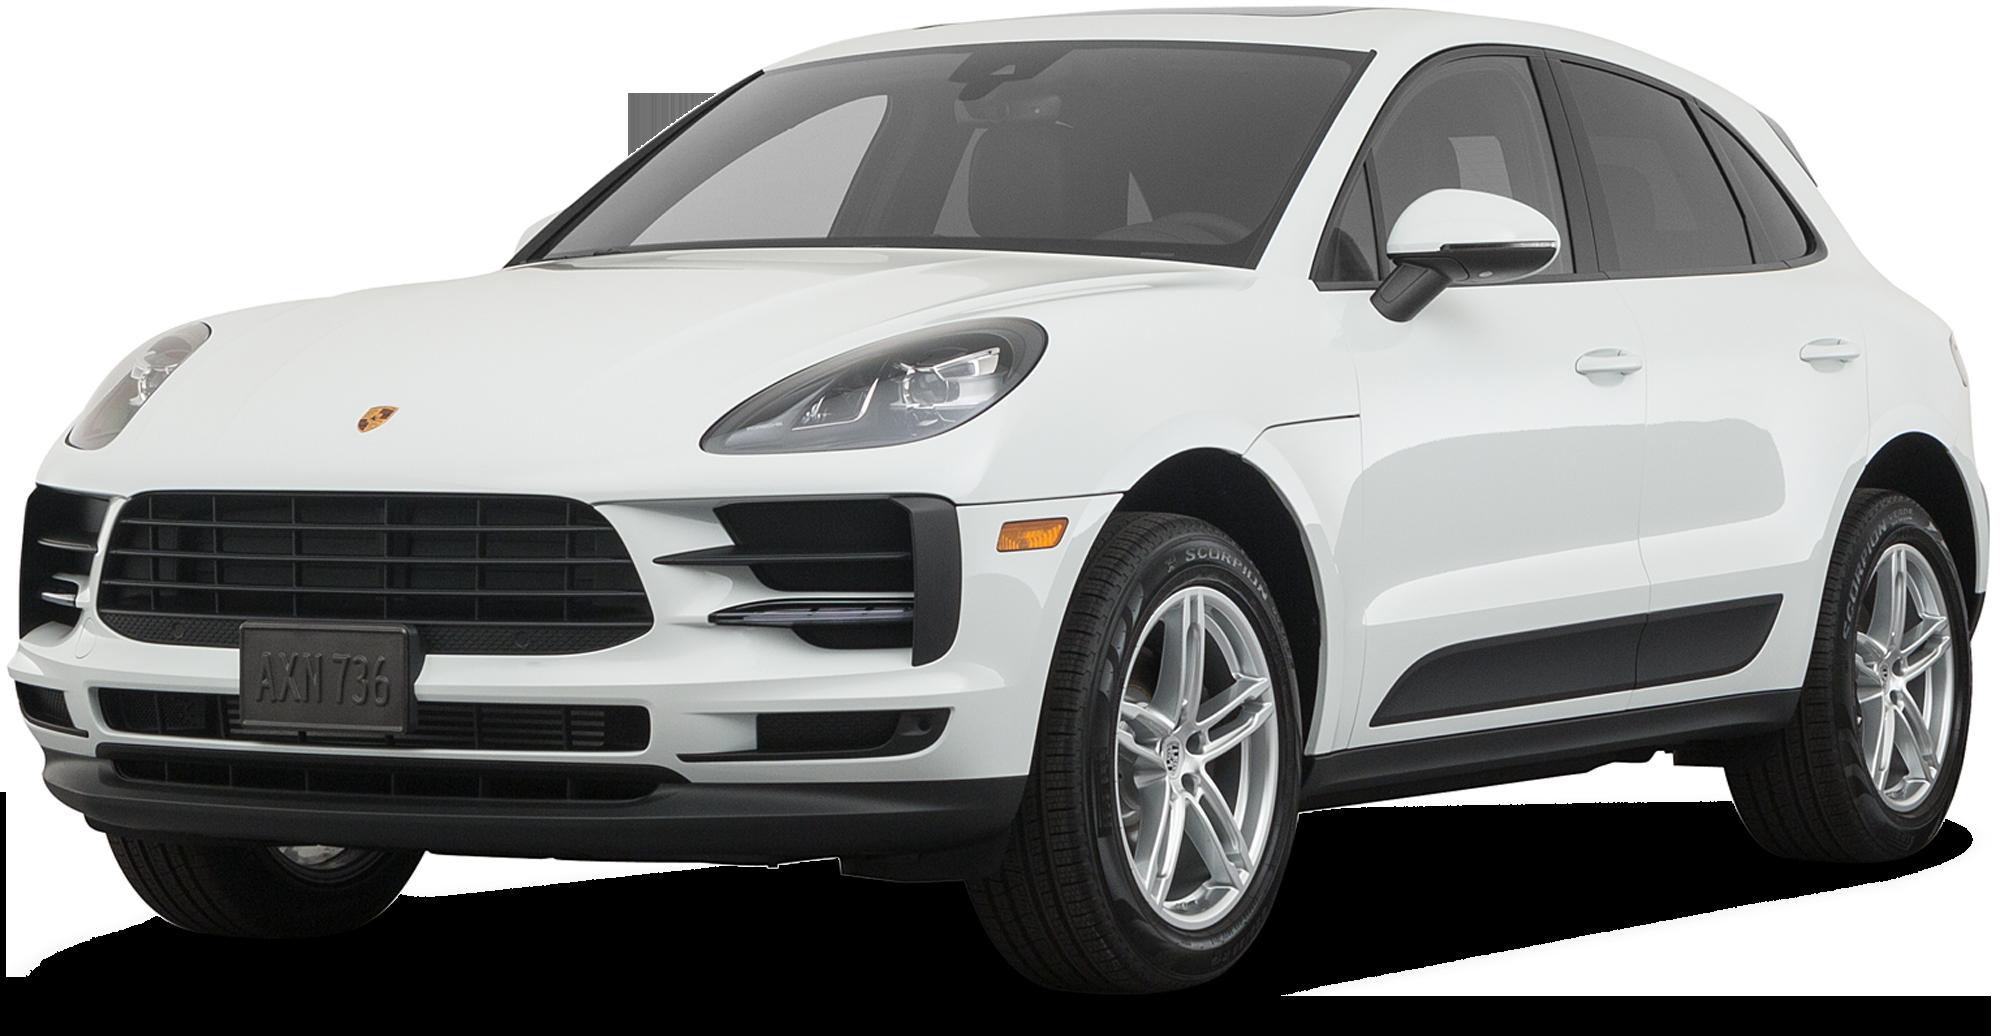 2020 Porsche Macan New Concept Hybrid - New SUV Price  |2020 Porsche Macan Suv